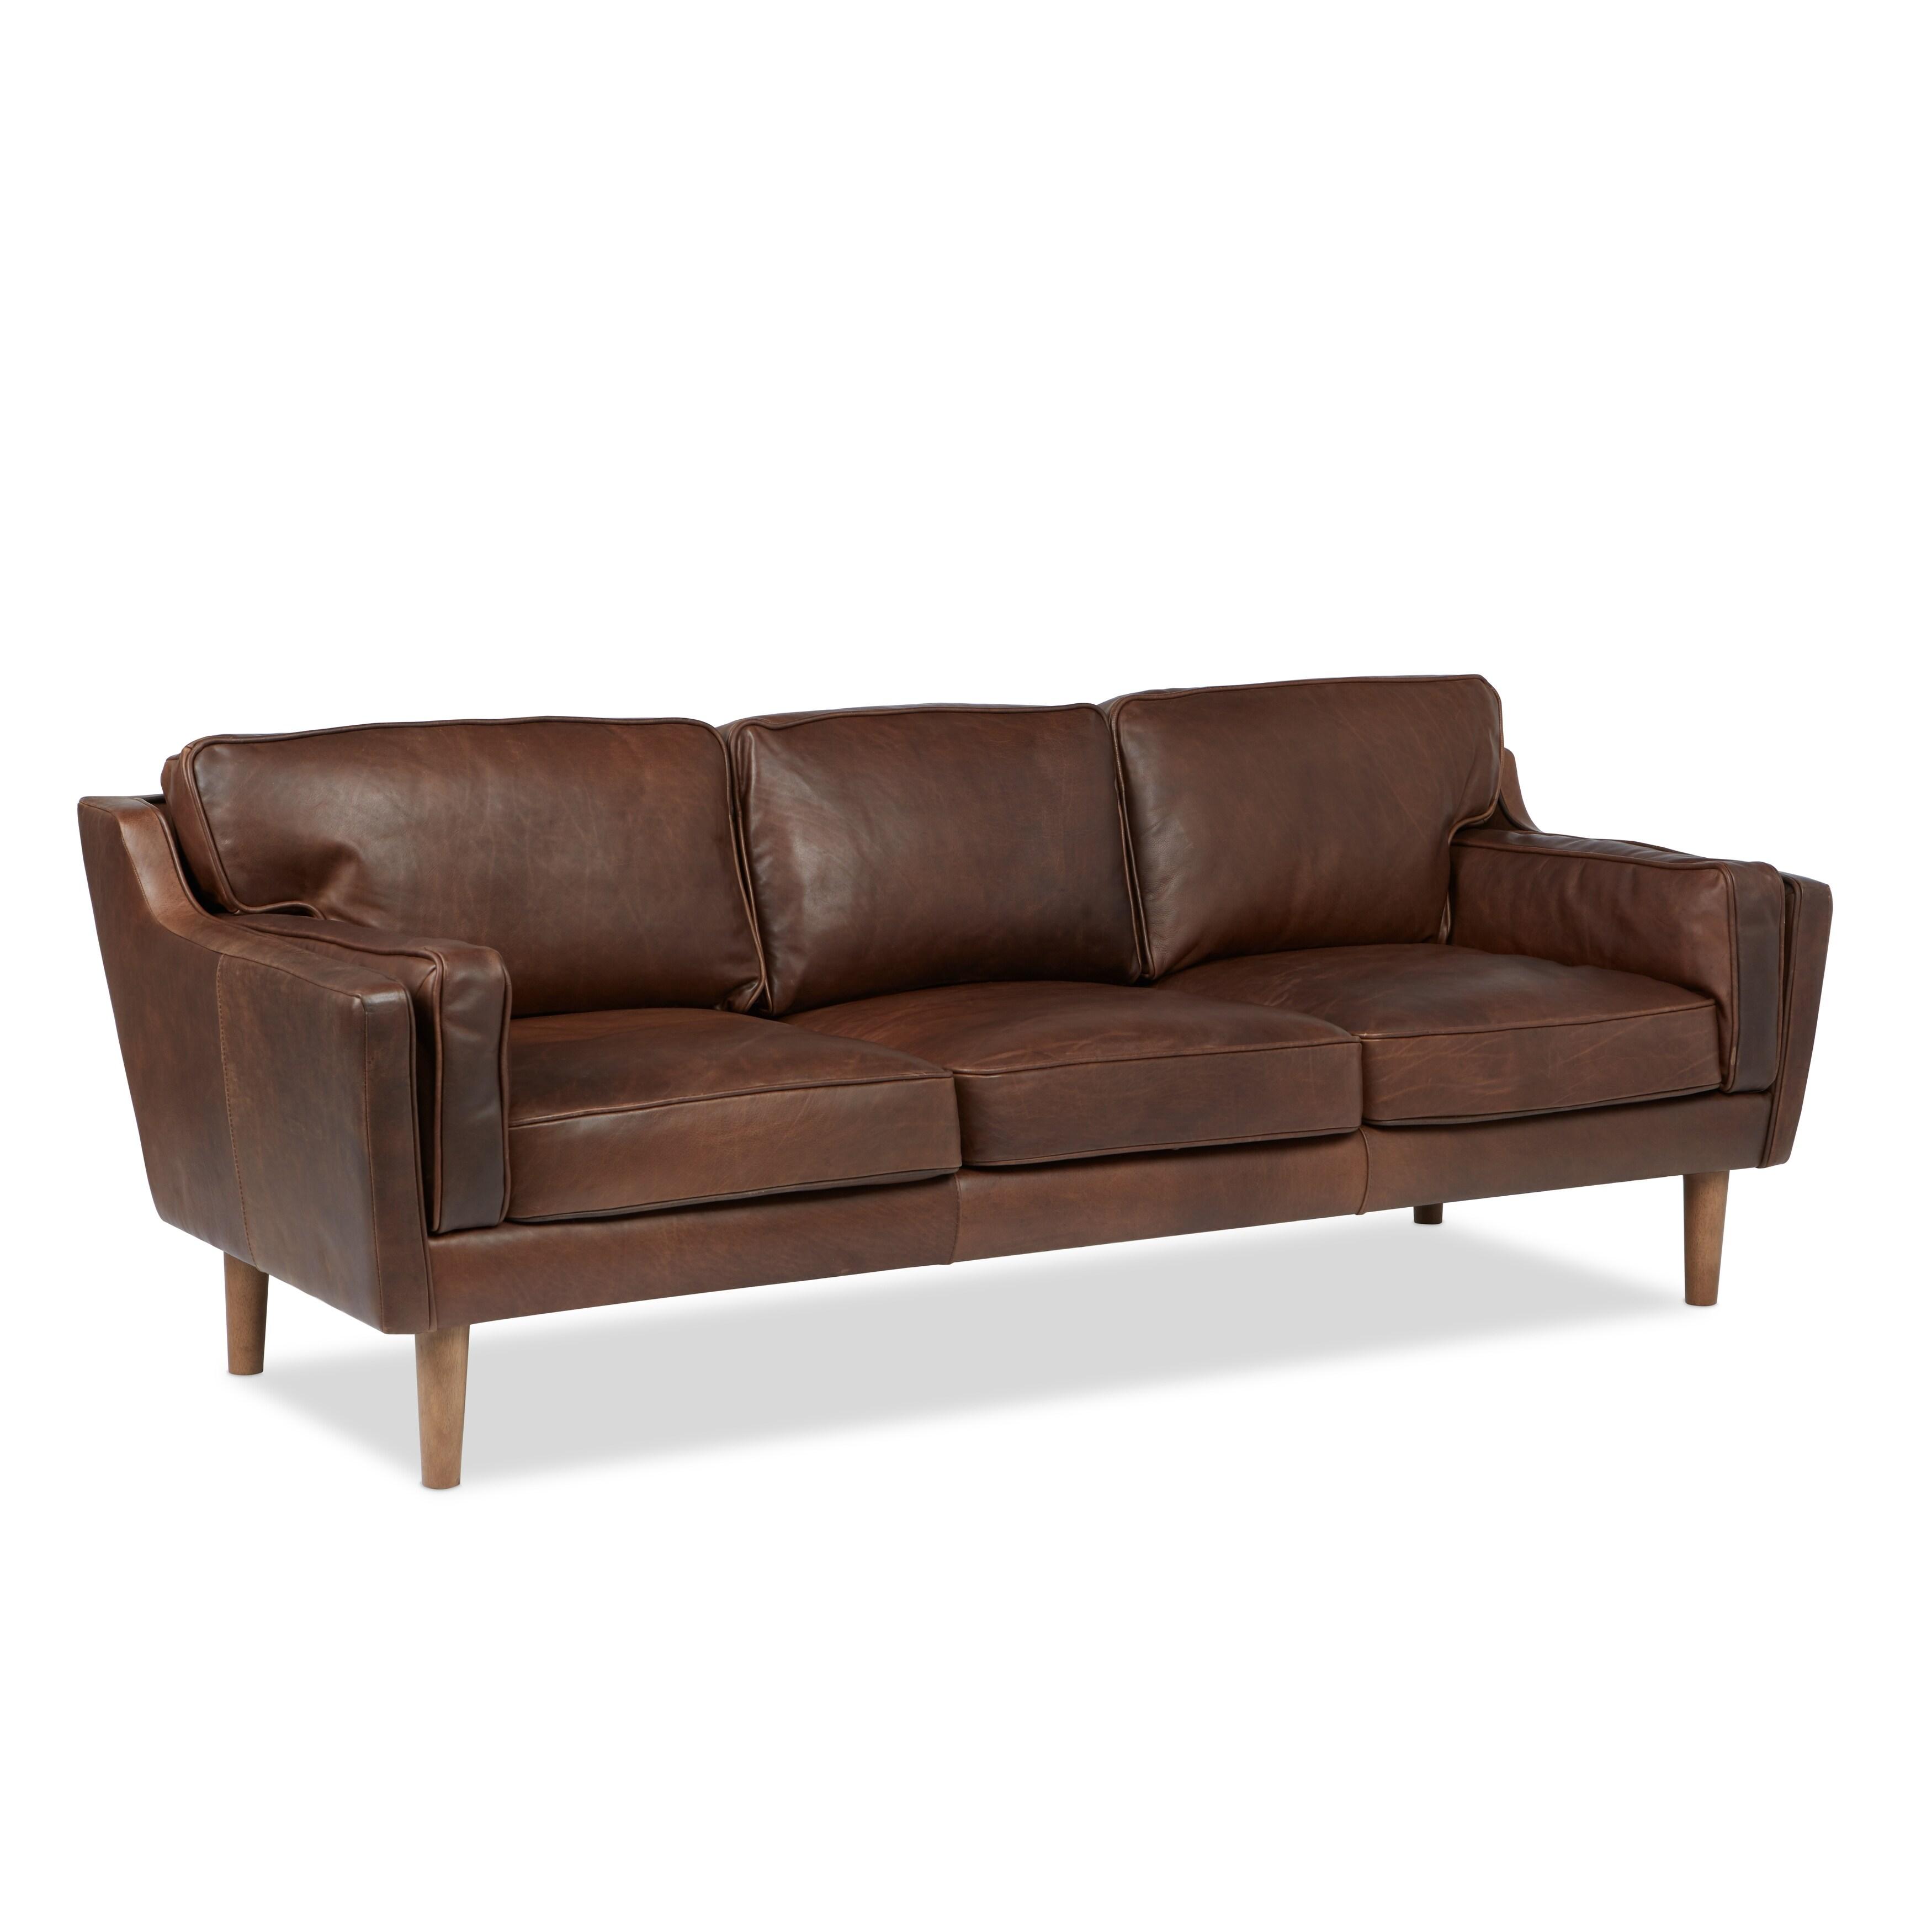 Jasper Laine Beatnik Leather Sofa Columbus Chocolate Free Shipping Today 8494277